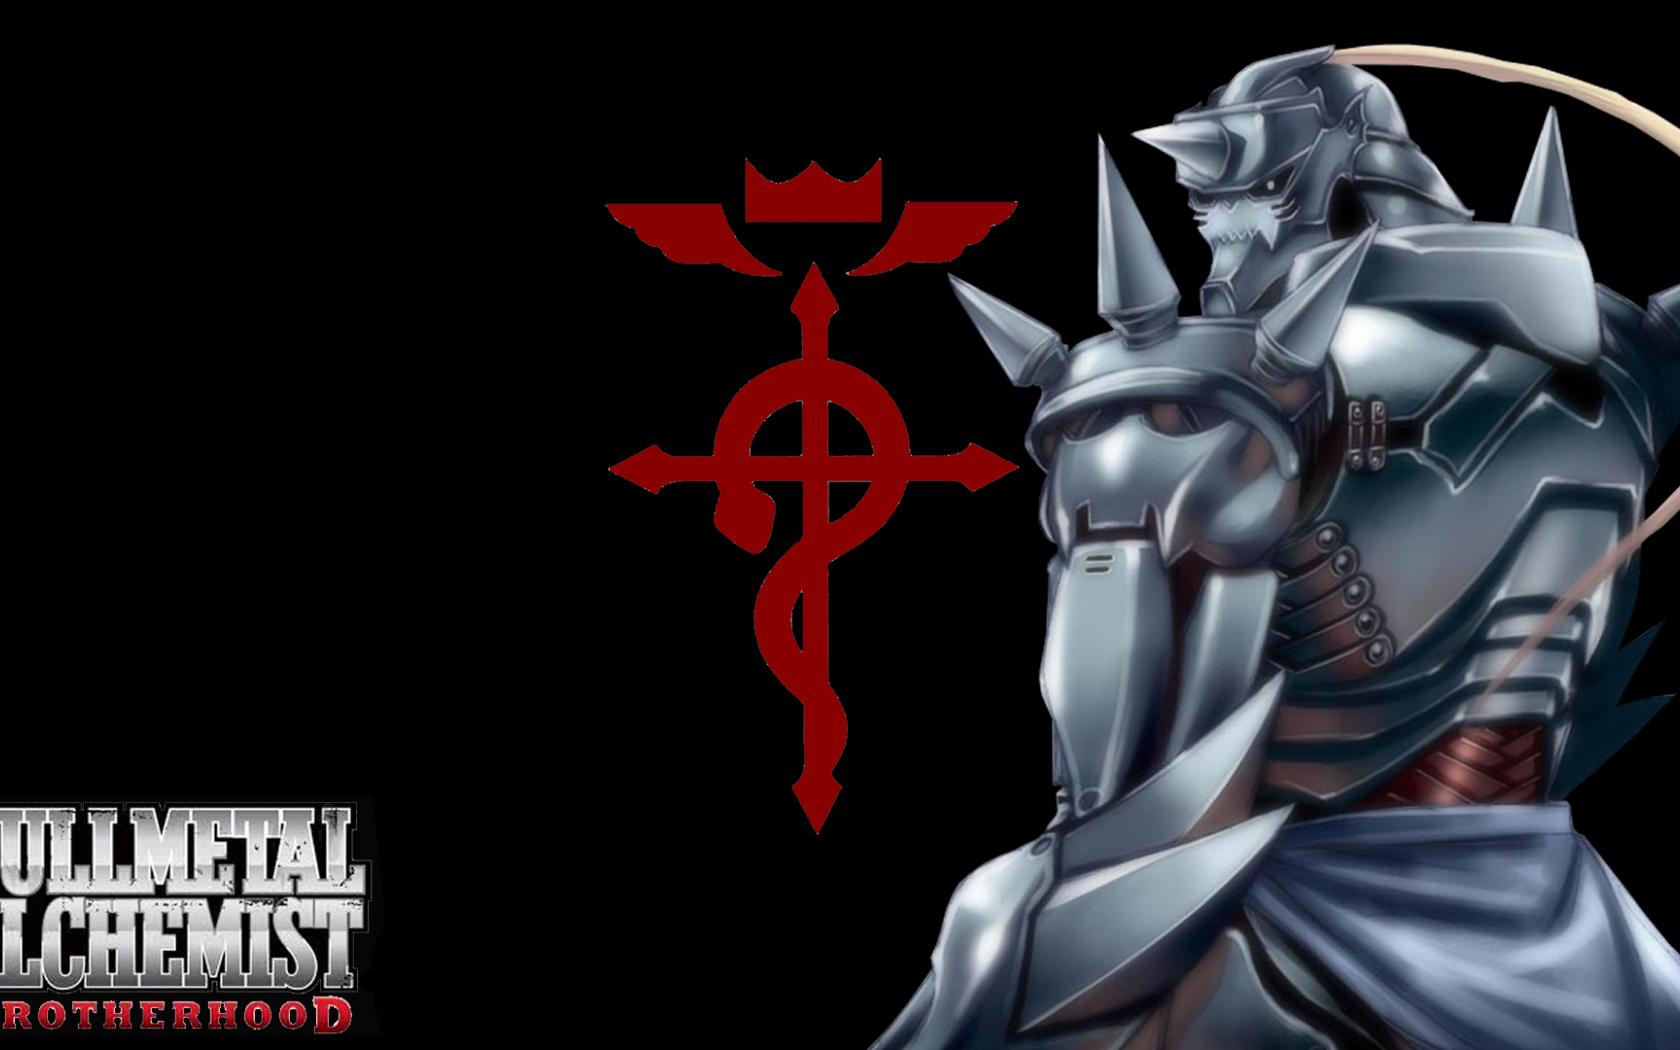 Free Download Fullmetal Alchemist Alphonse Computer Backgrounds